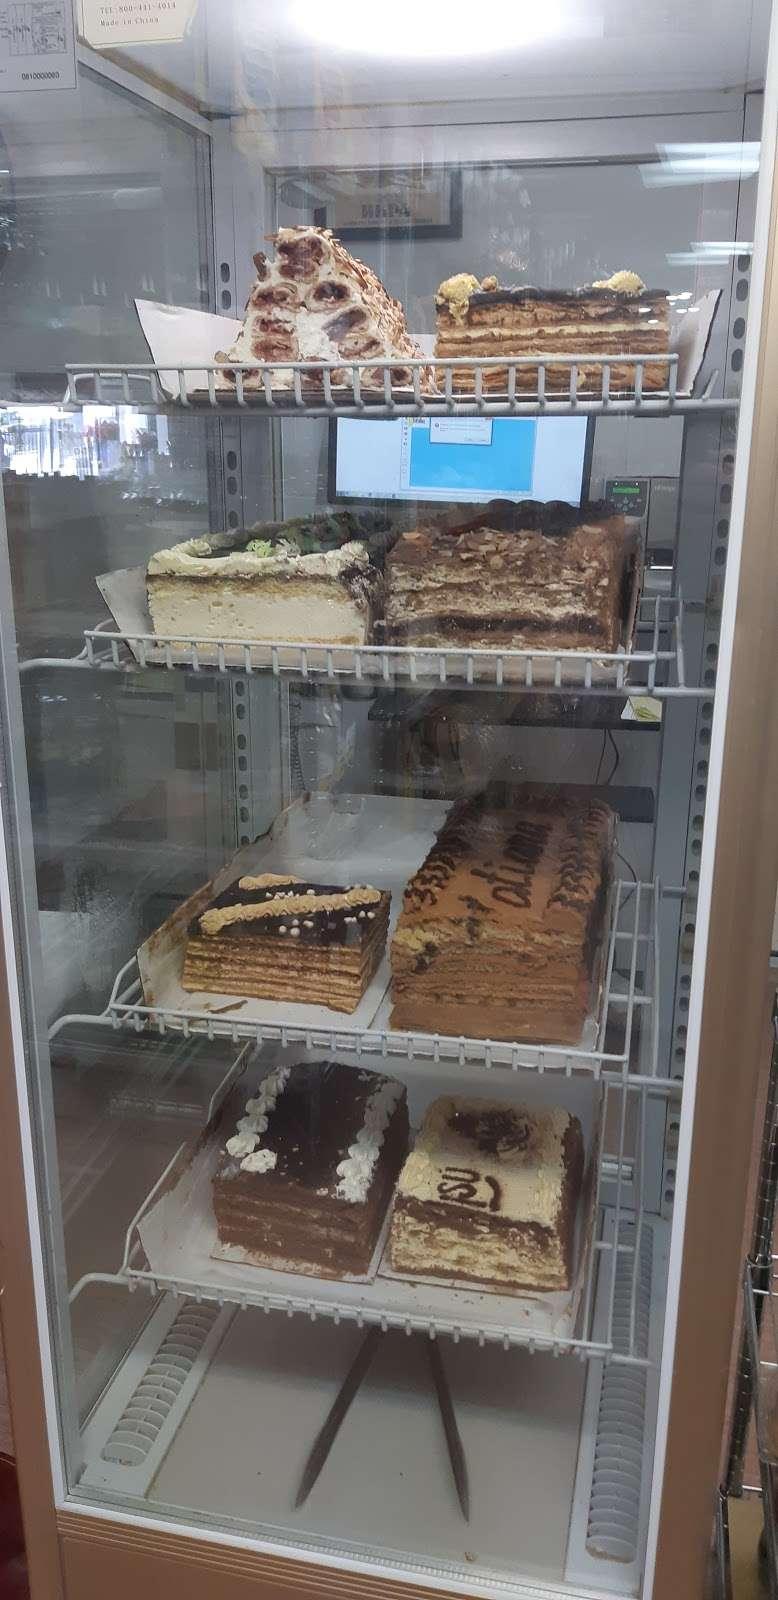 Russian Store - store  | Photo 1 of 10 | Address: 683 NE 79th St, Miami, FL 33138, USA | Phone: (305) 758-2005